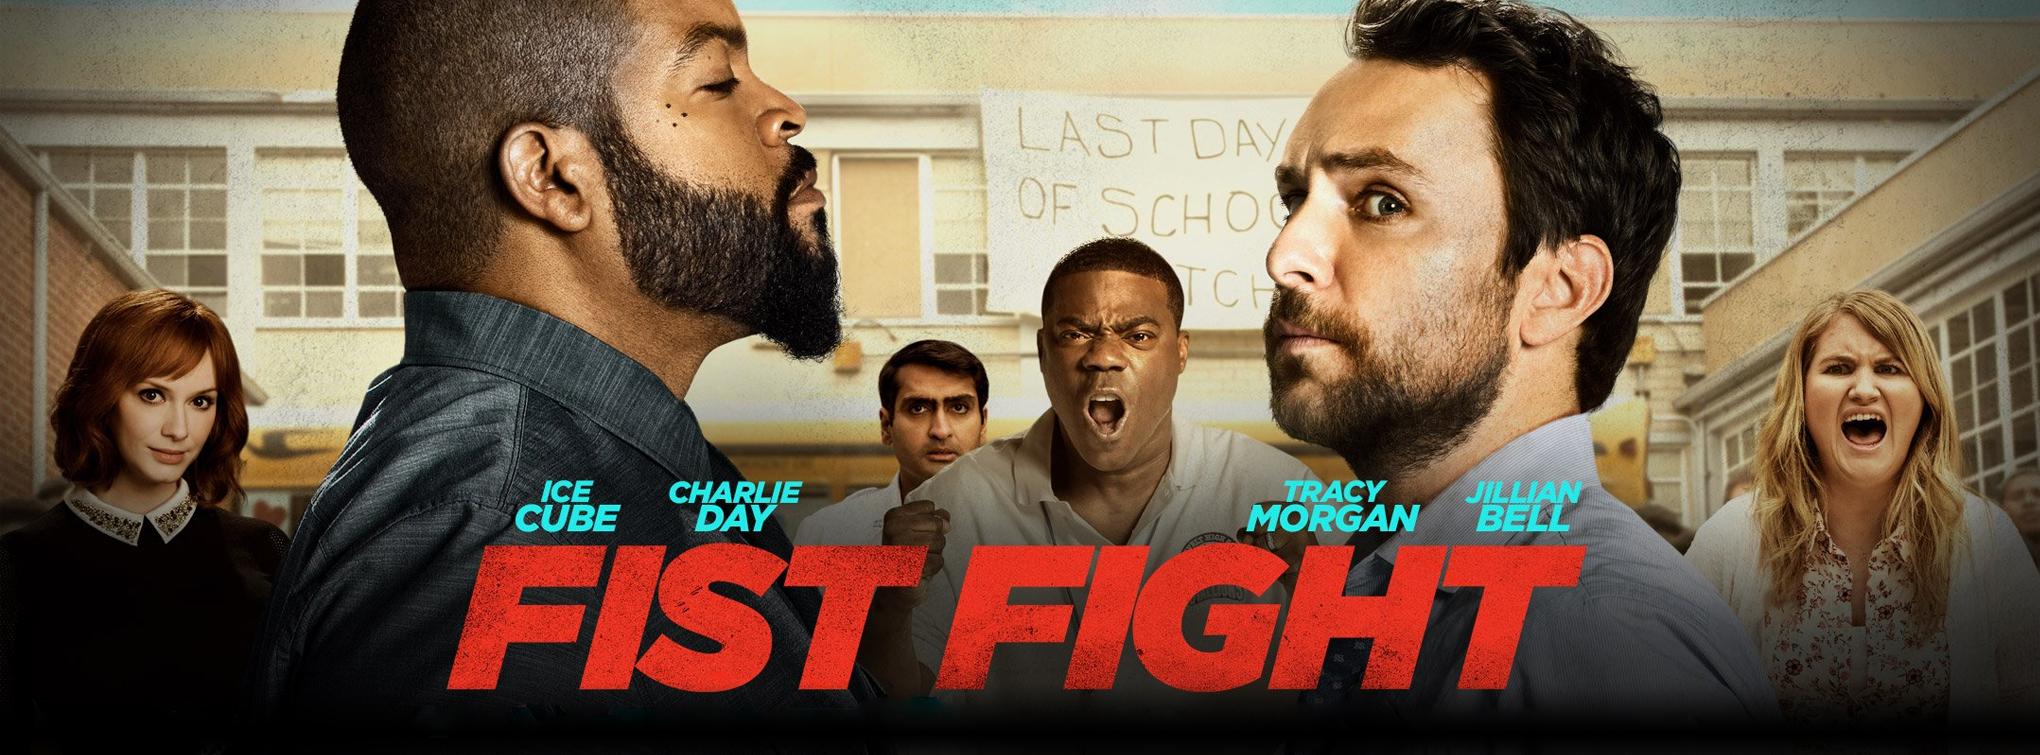 Fist Fight - premieres Thursday, February 16!